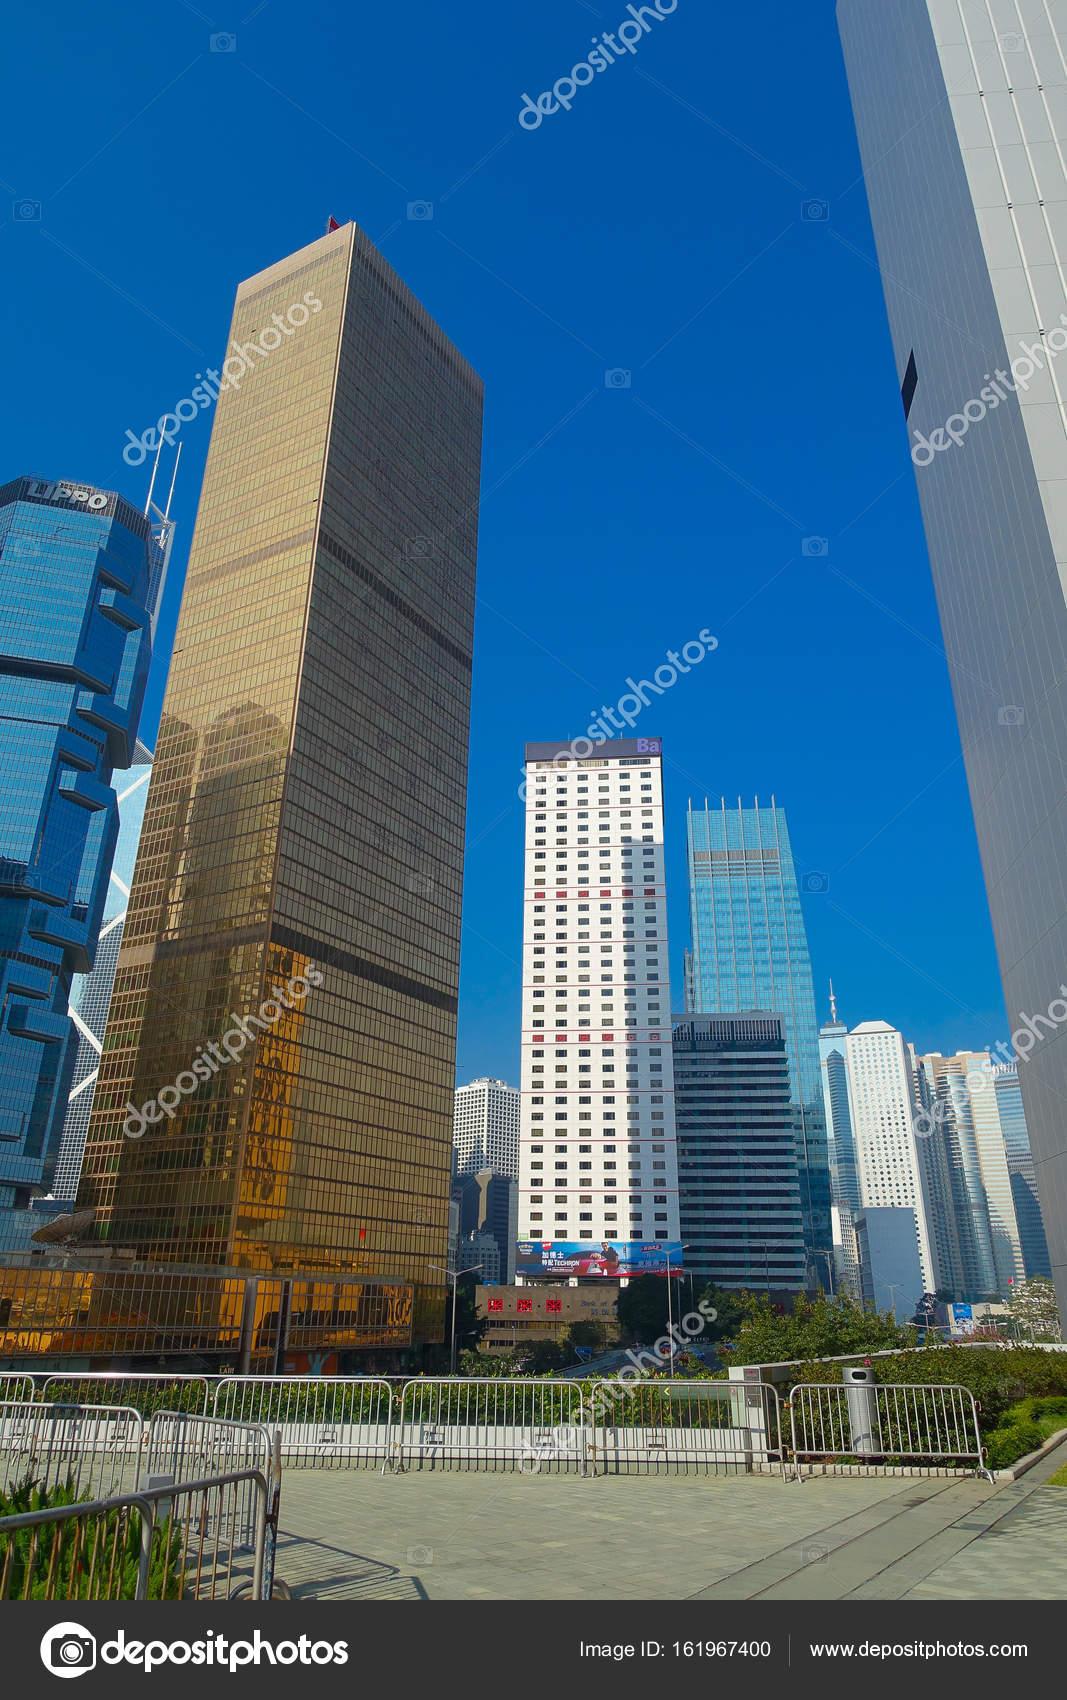 hong kong china january 26 2017 modern buildings in finance